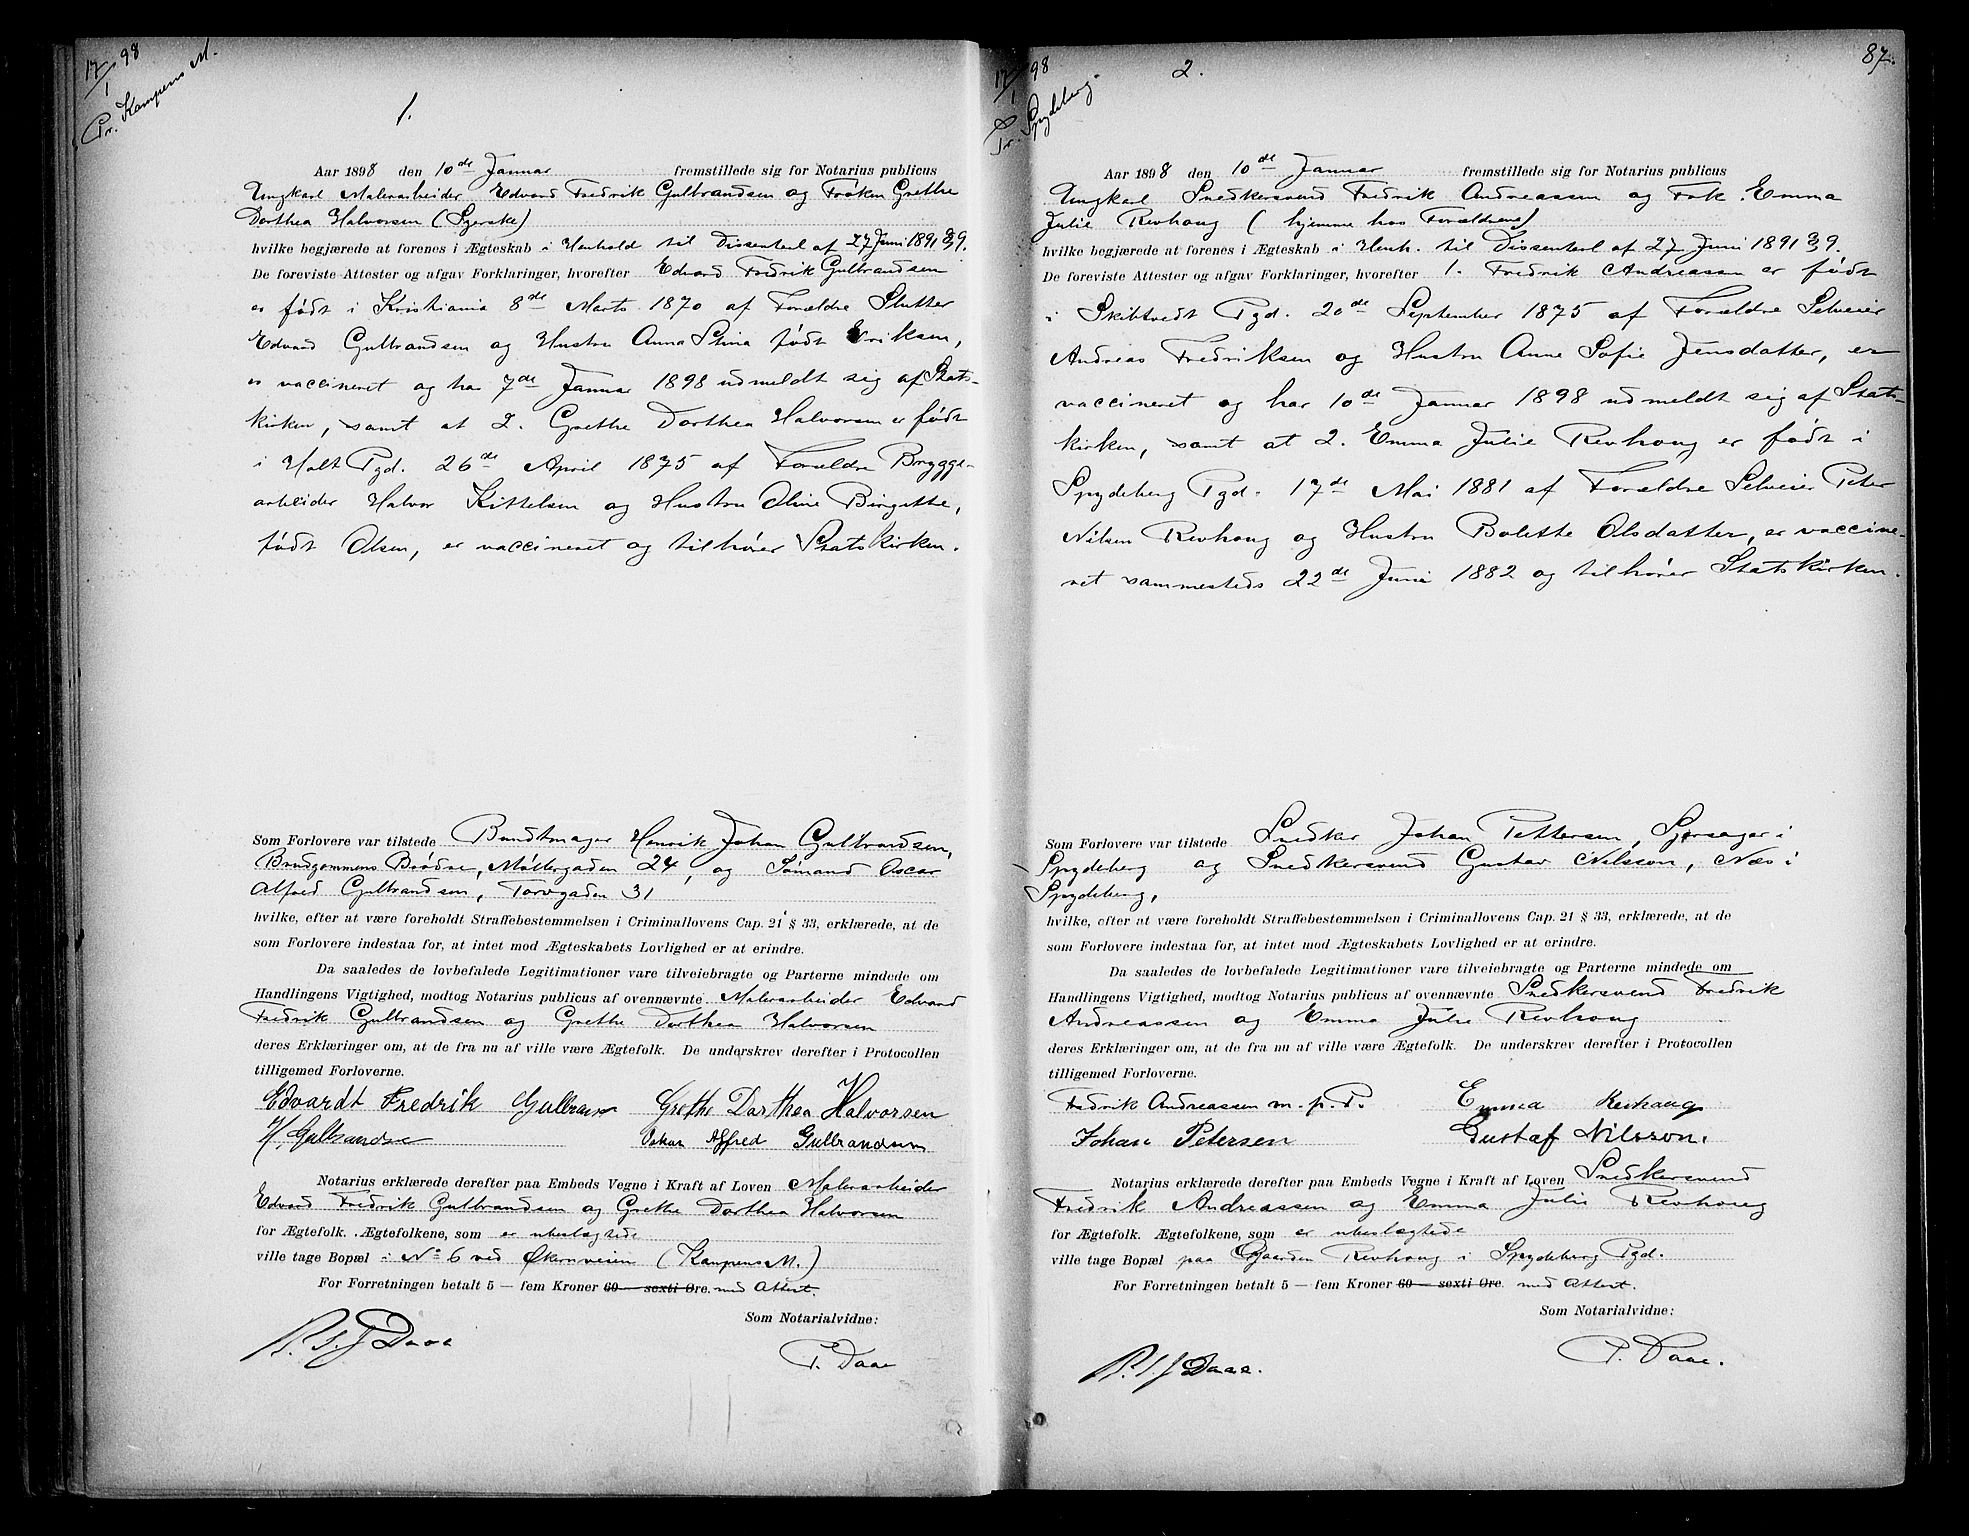 SAO, Oslo byfogd avd. I, L/Lb/Lbb/L0004: Notarialprotokoll, rekke II: Vigsler, 1897-1902, s. 86b-87a